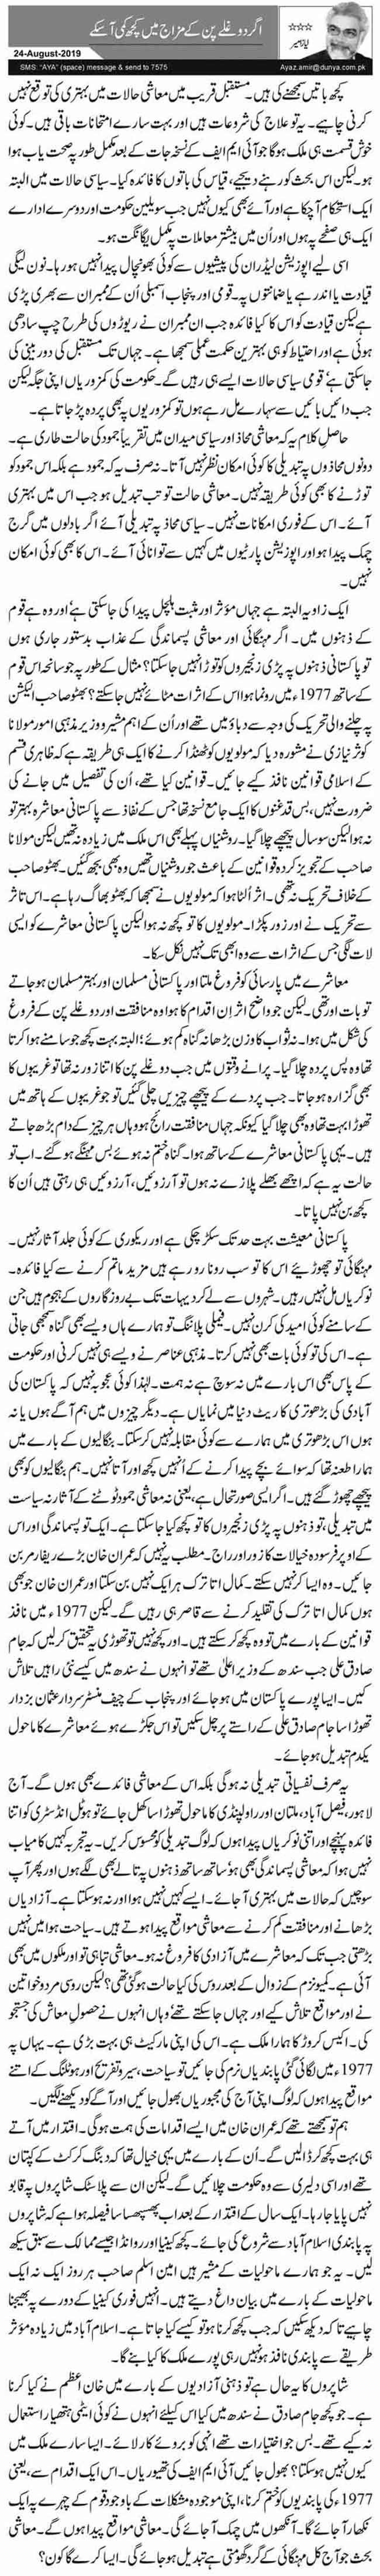 Ayaz Amir column dated: 24 August 2019